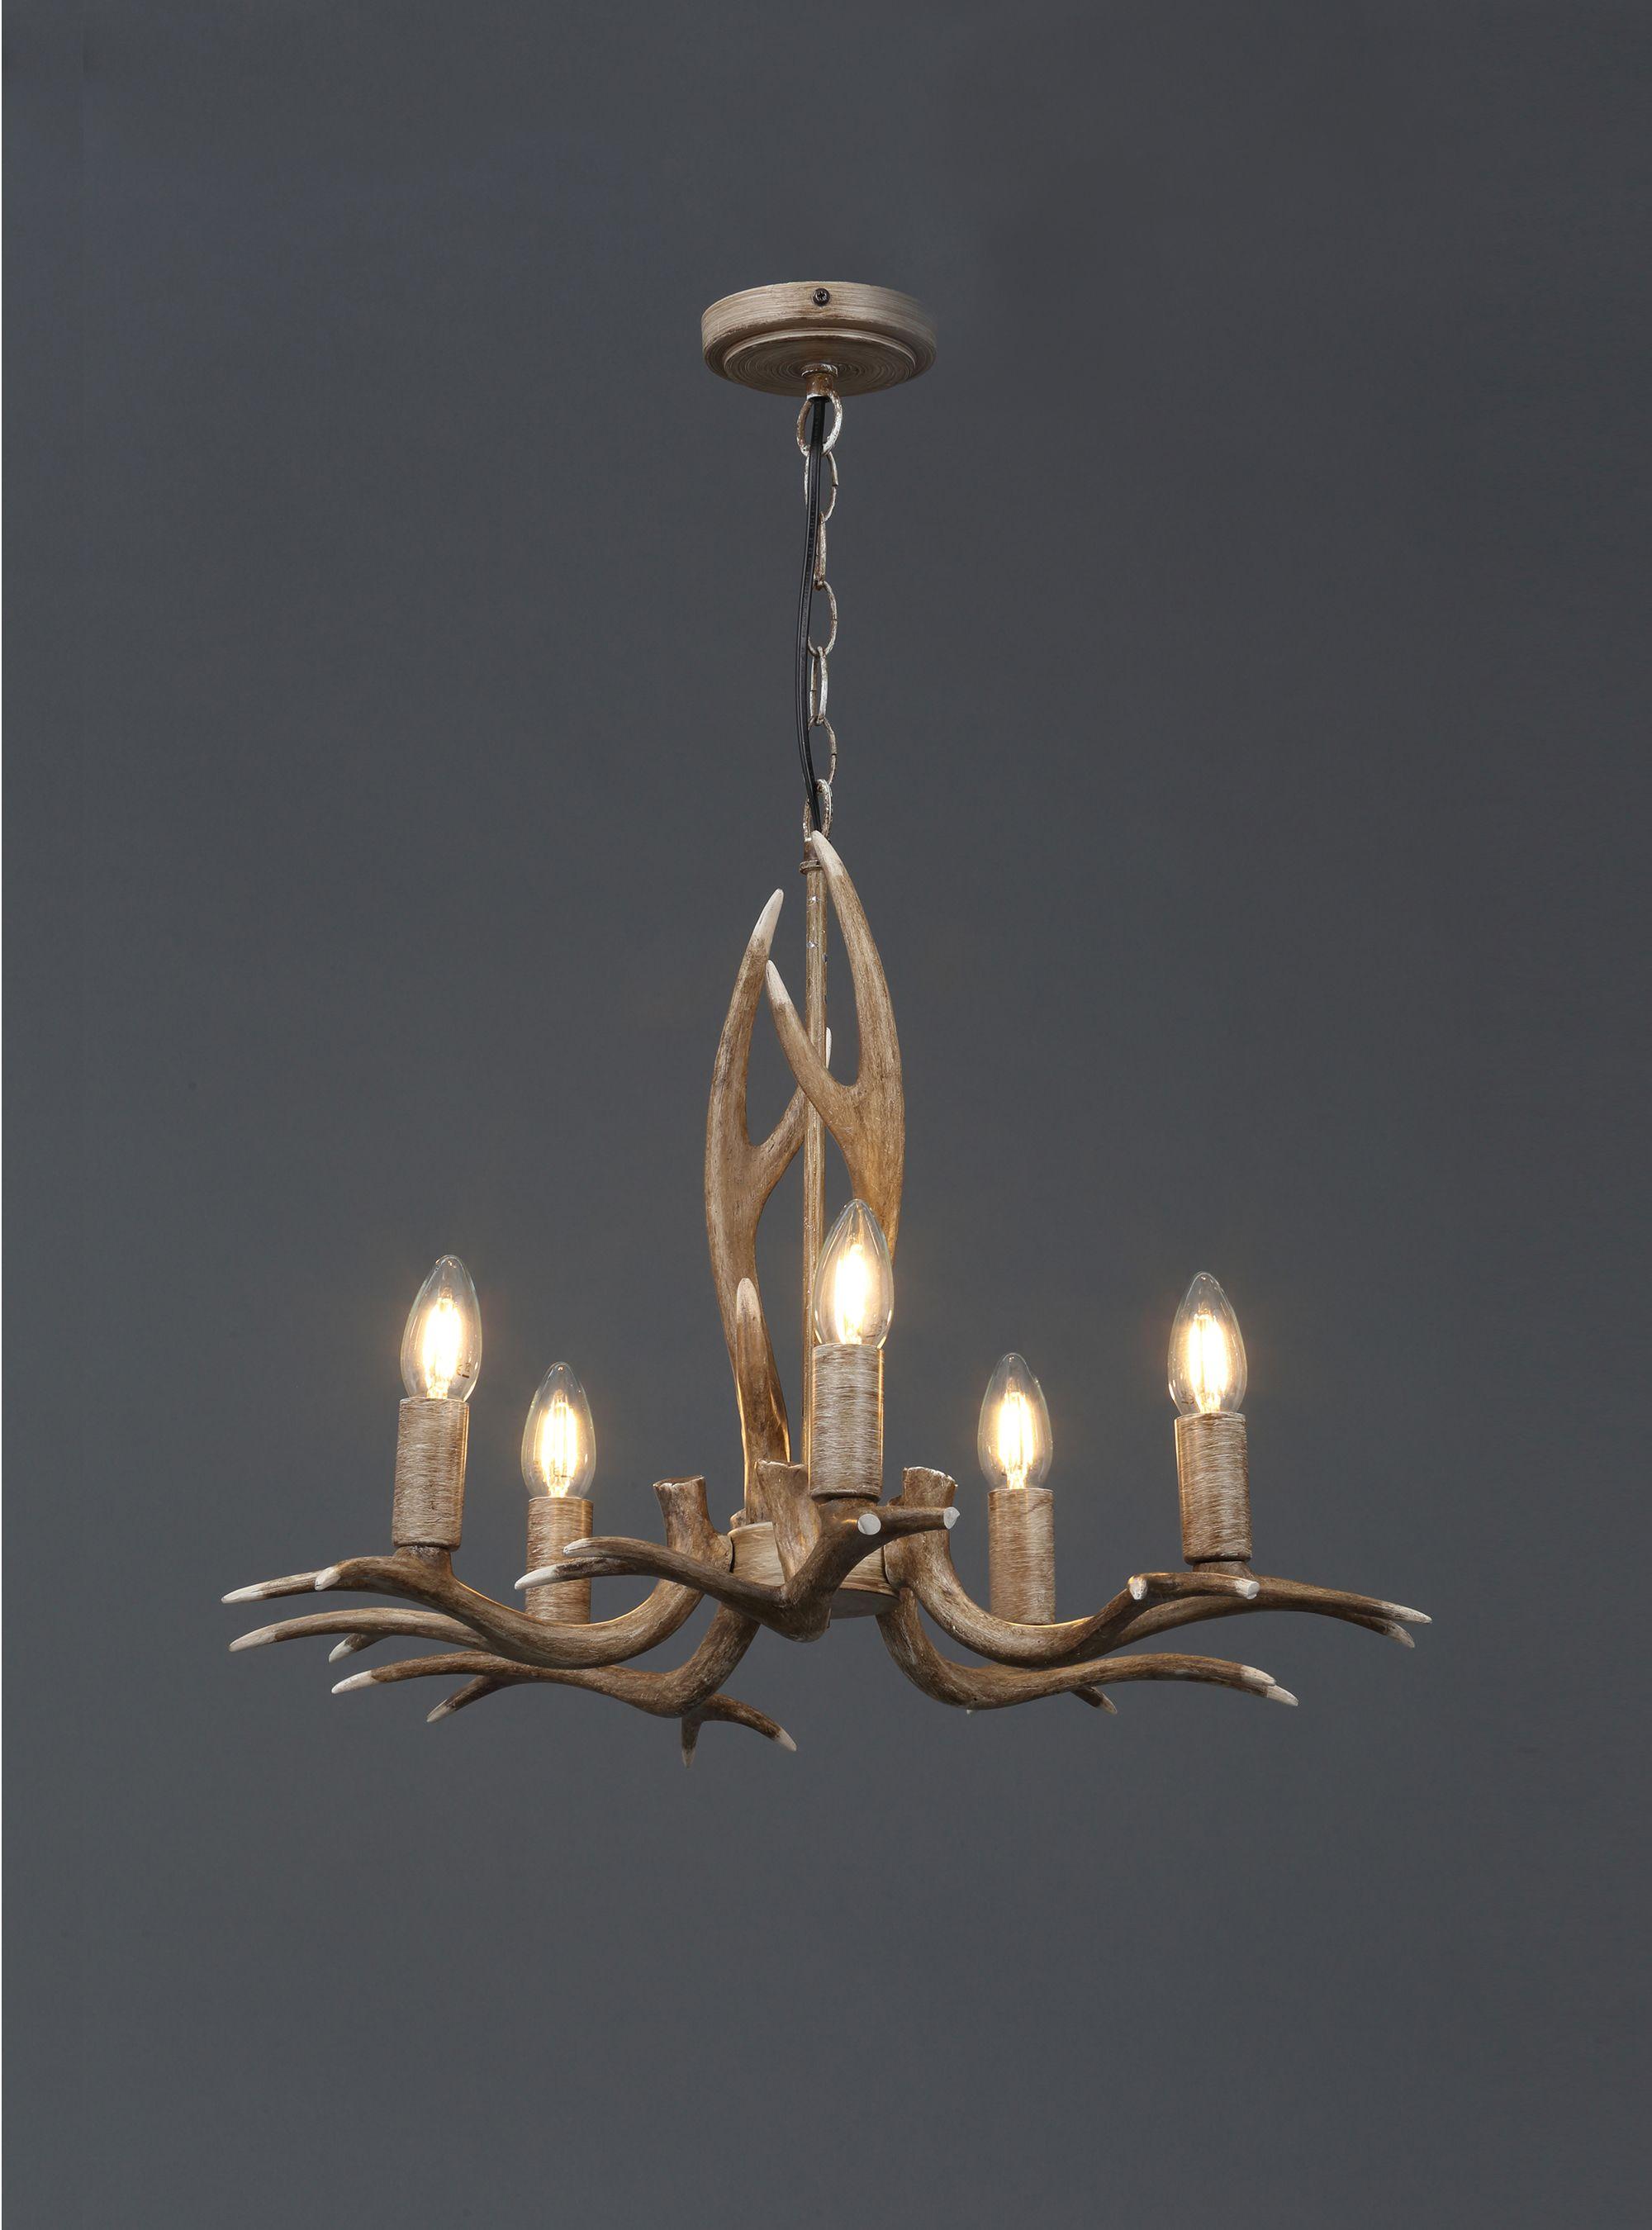 Hela Wood Effect 5 Lamp Pendant Ceiling